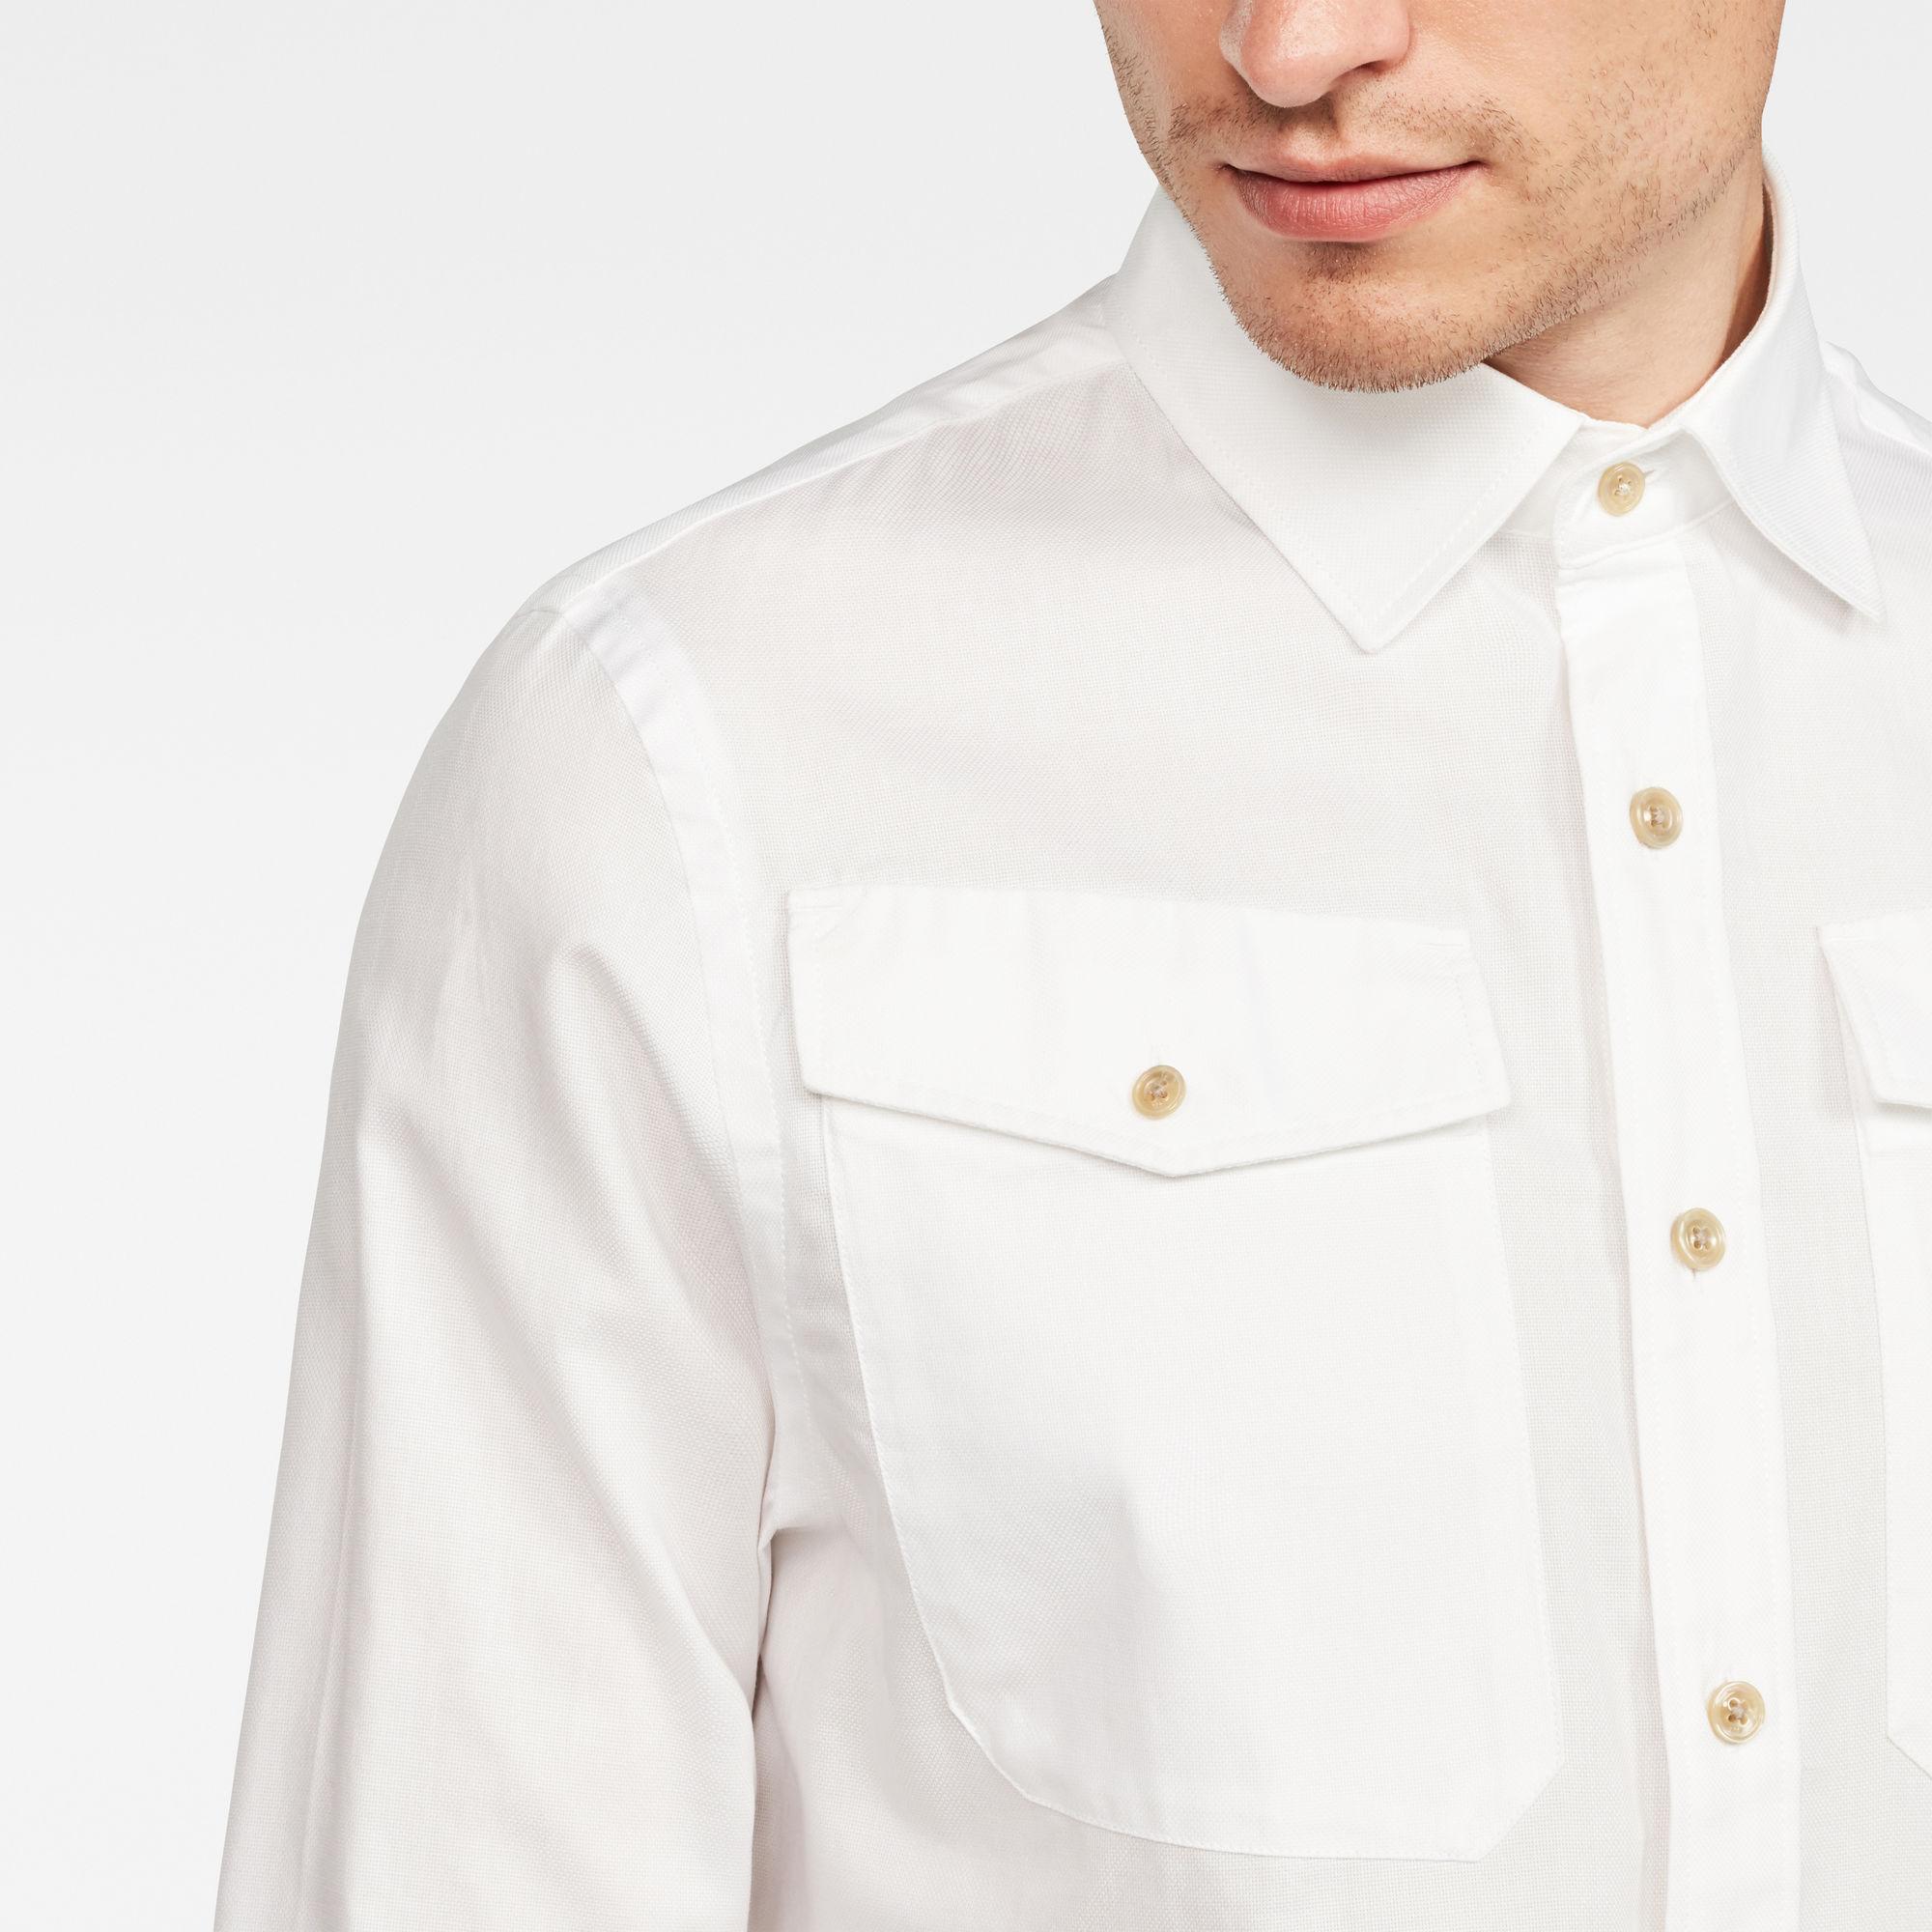 Bristum Utility Shirt